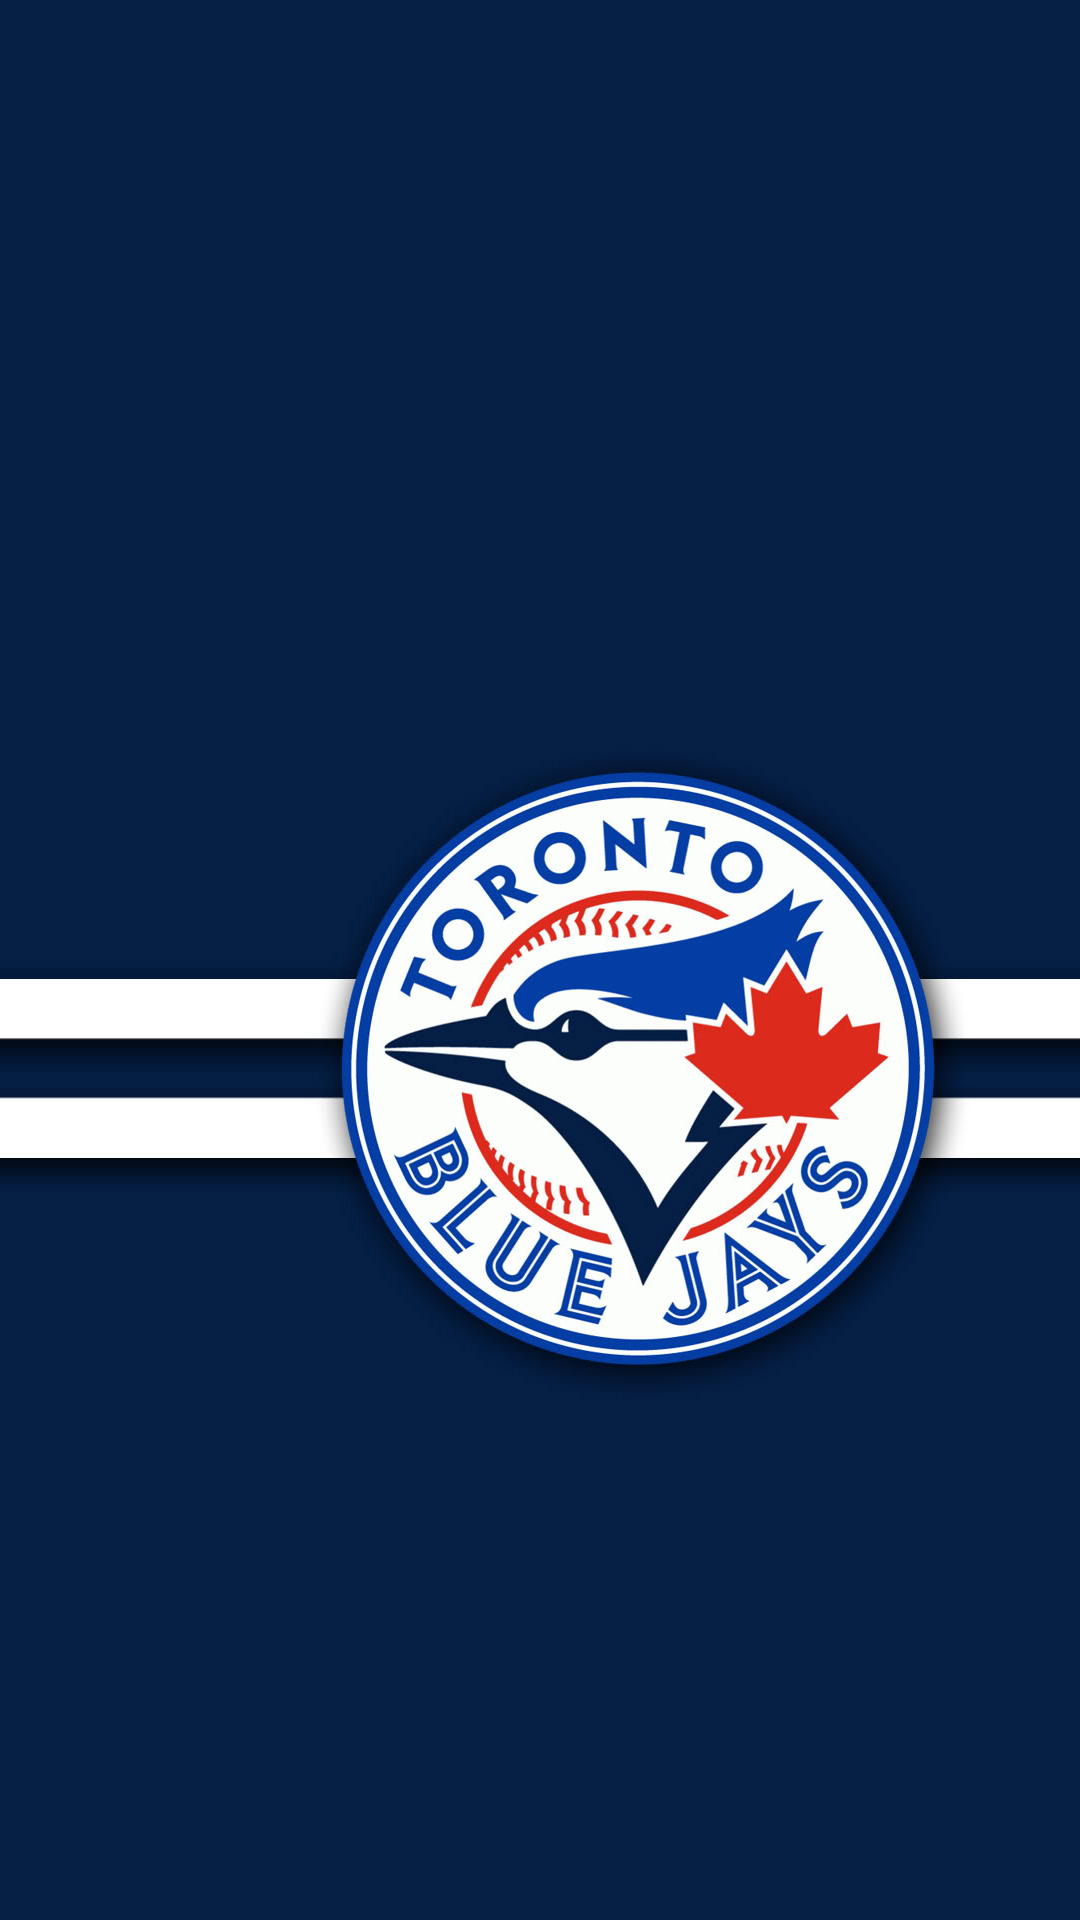 Toronto Blue Jays iPhone Wallpaper HD 1080x1920